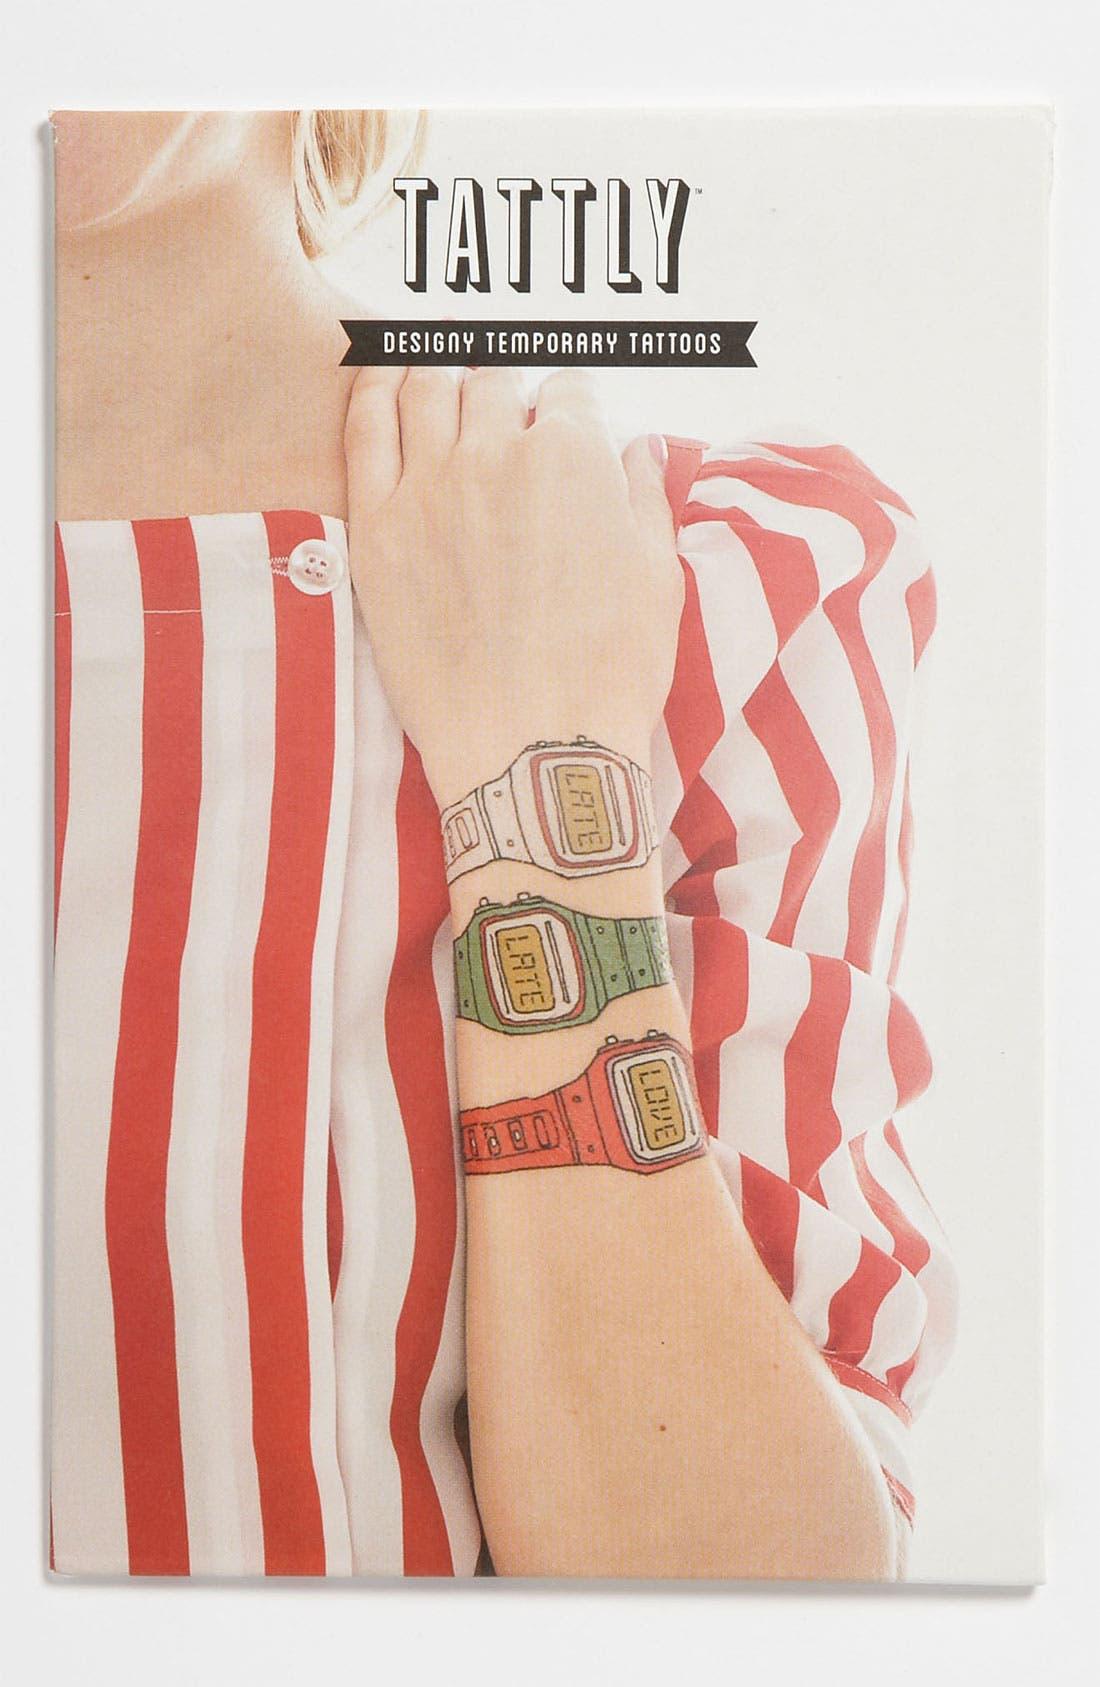 Alternate Image 1 Selected - Tattly 'Watch' Temporary Tattoo Set (Girls)